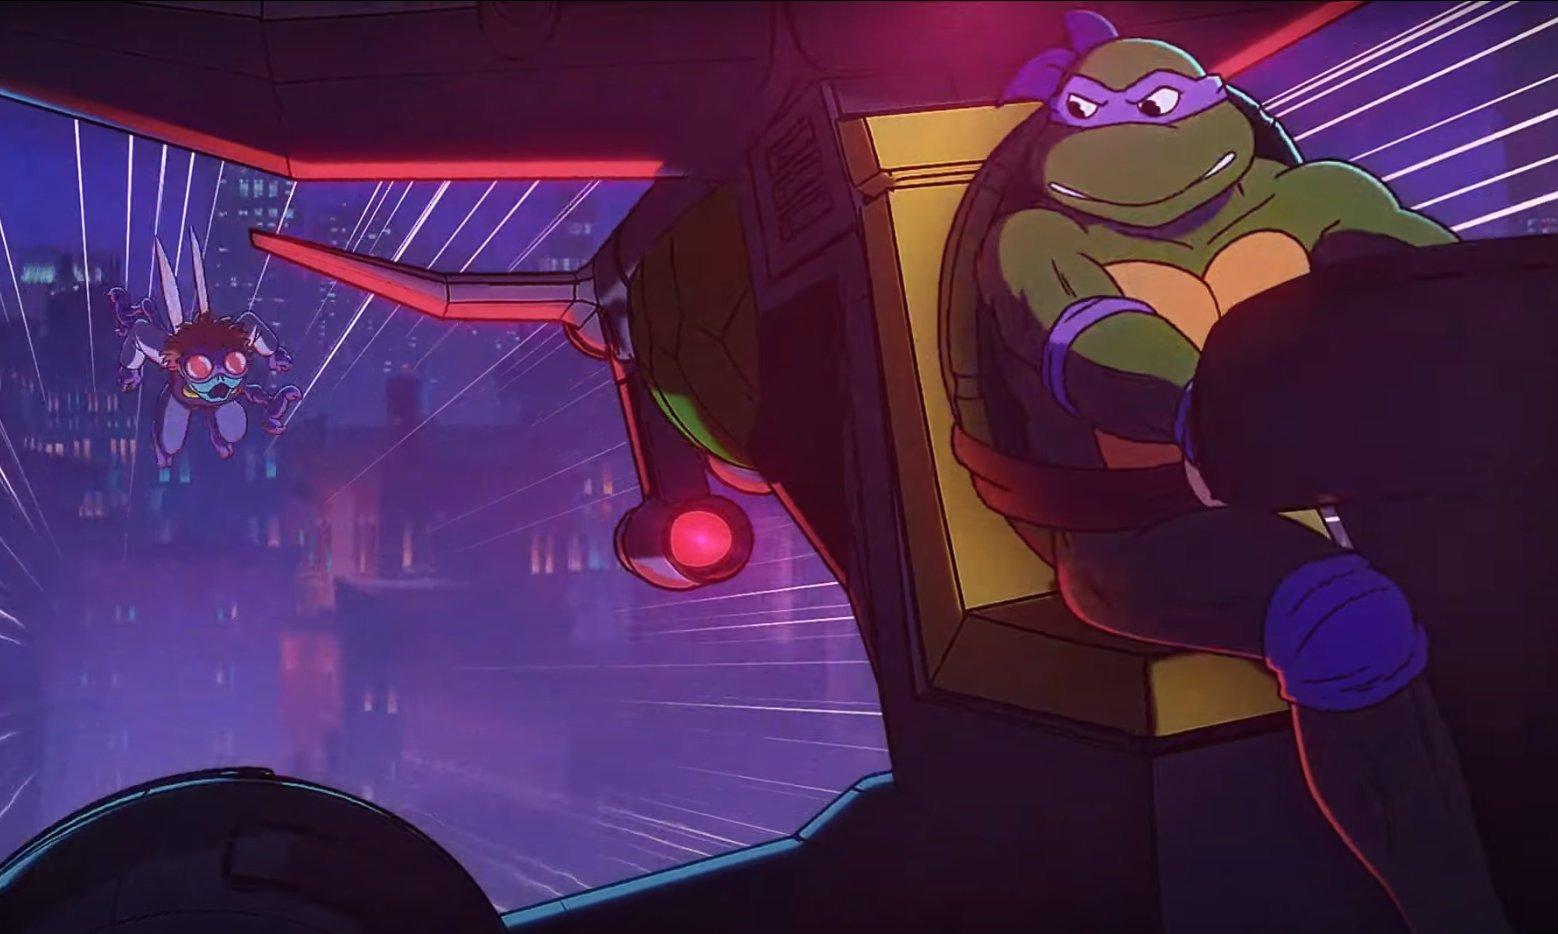 Donatello flies away from Baxter Stockman